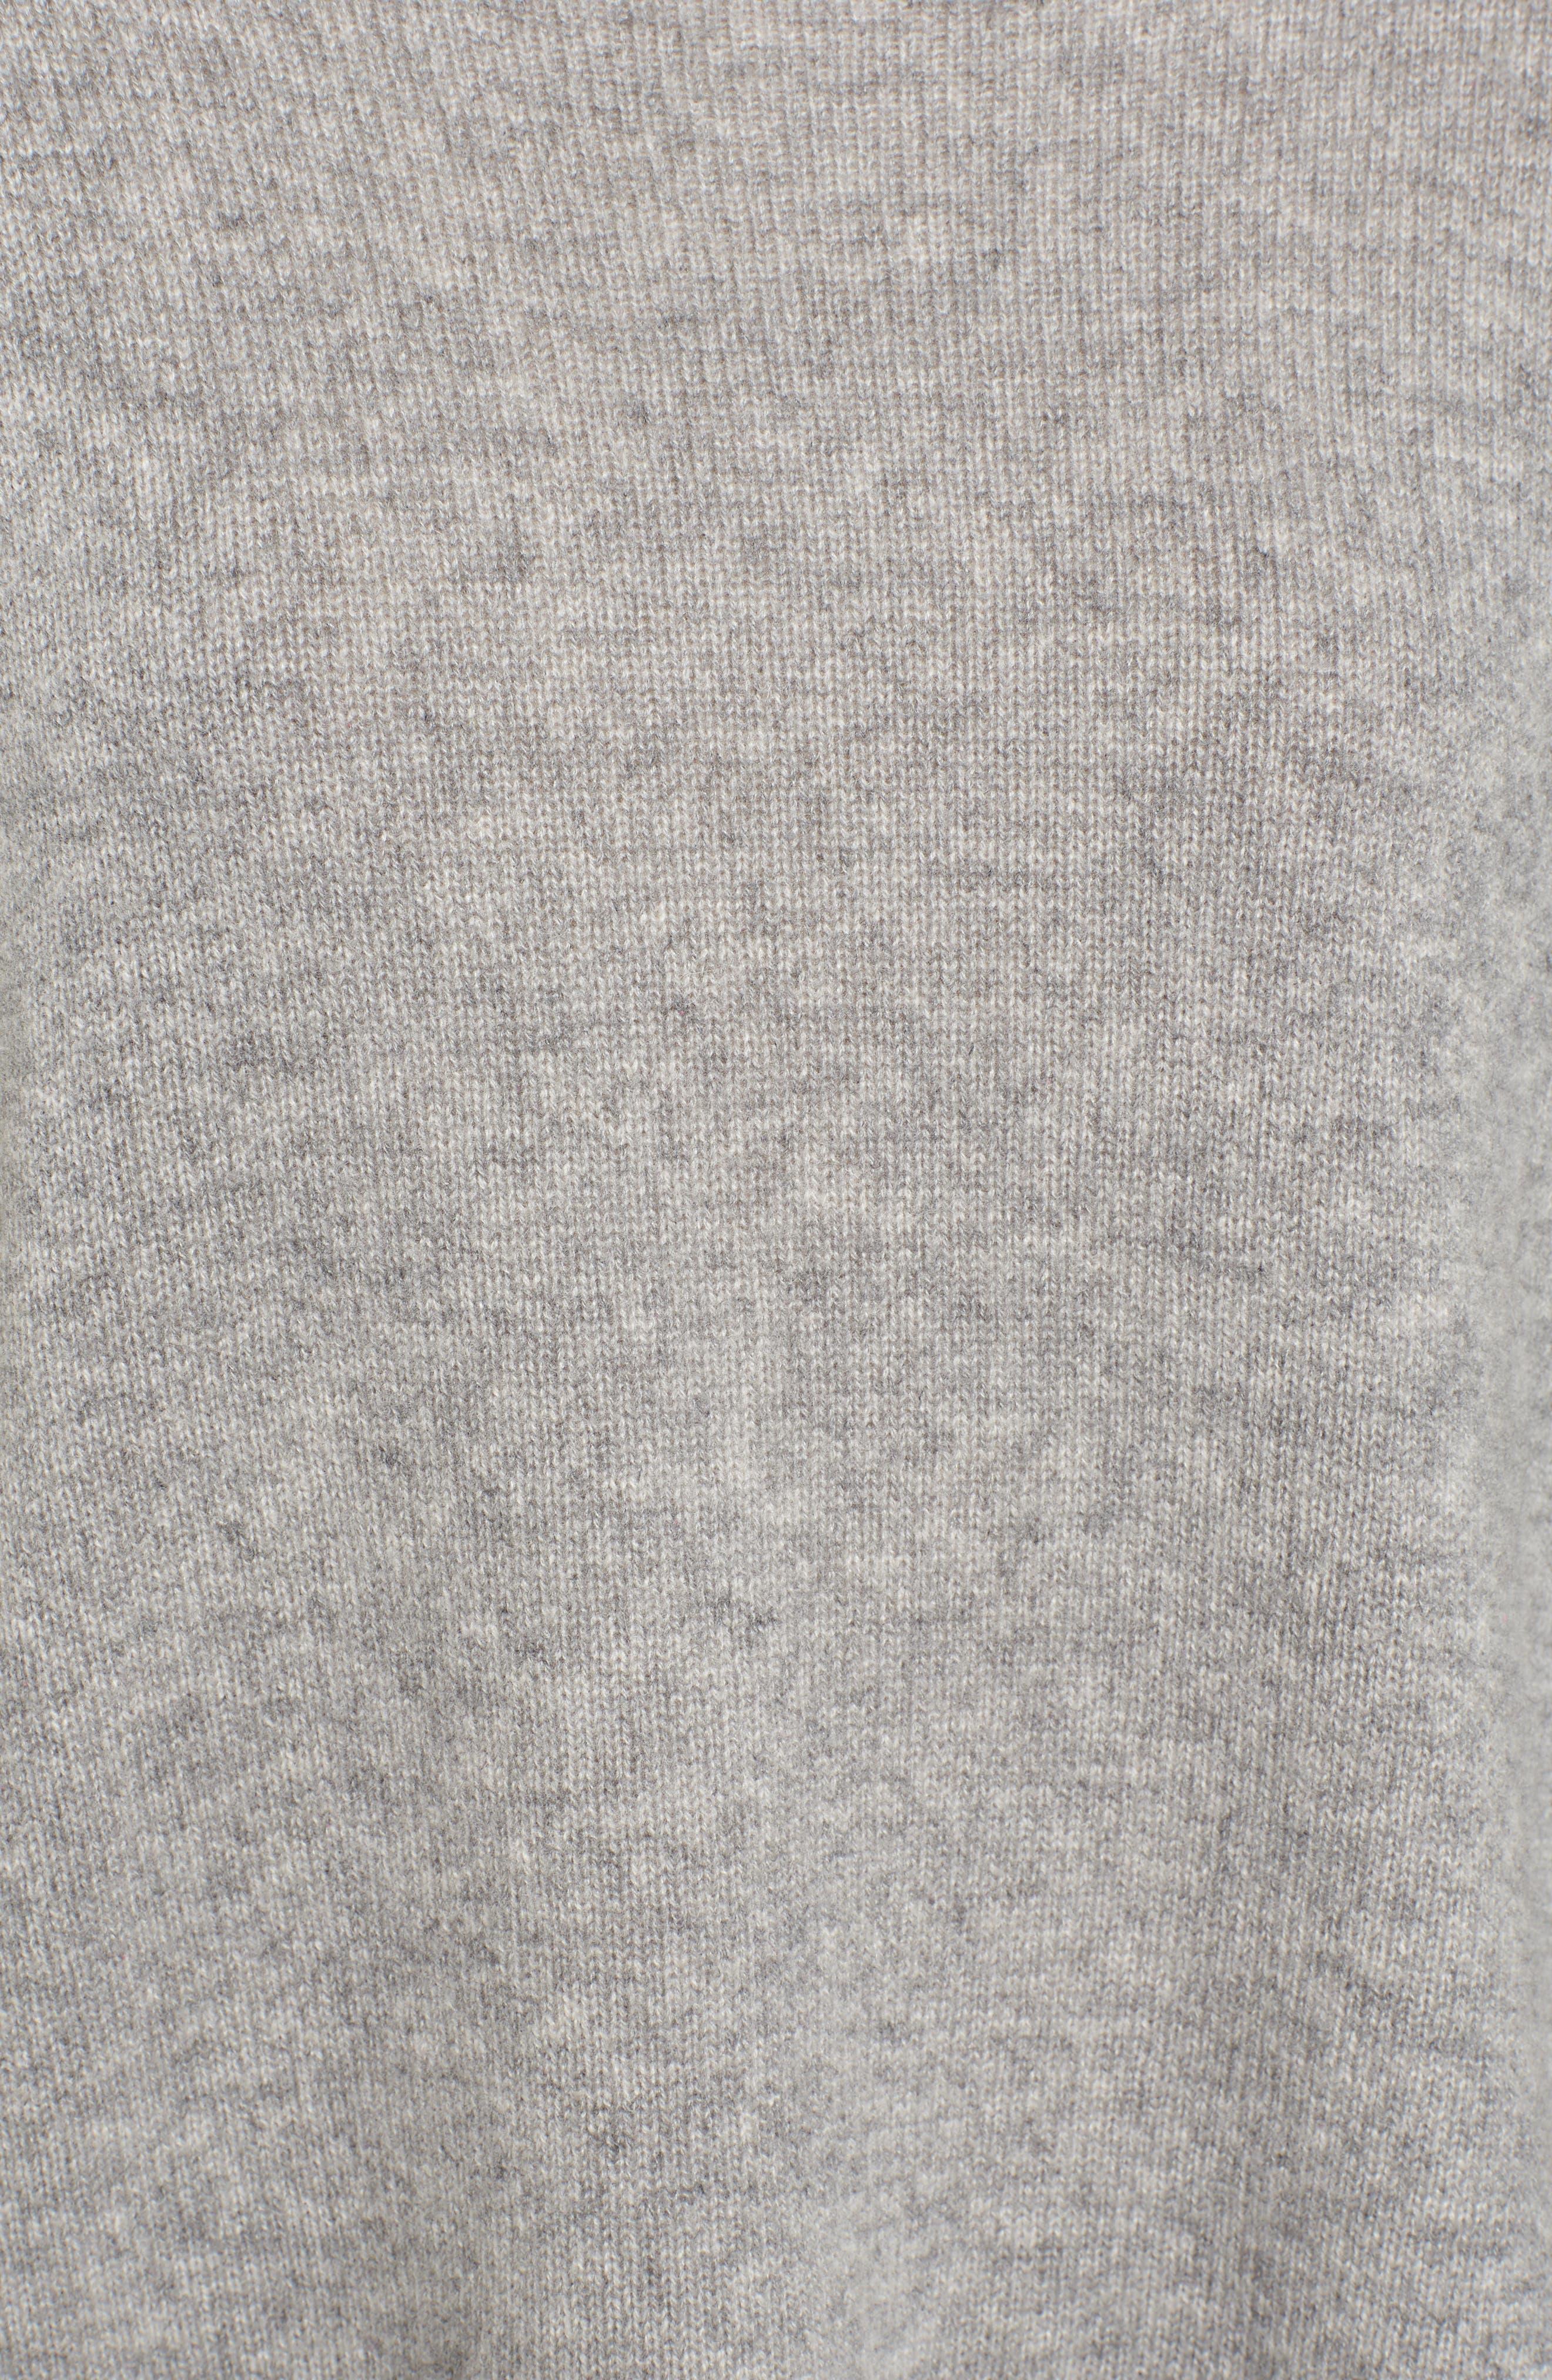 Mock Neck Cashmere Sweater,                             Alternate thumbnail 5, color,                             086